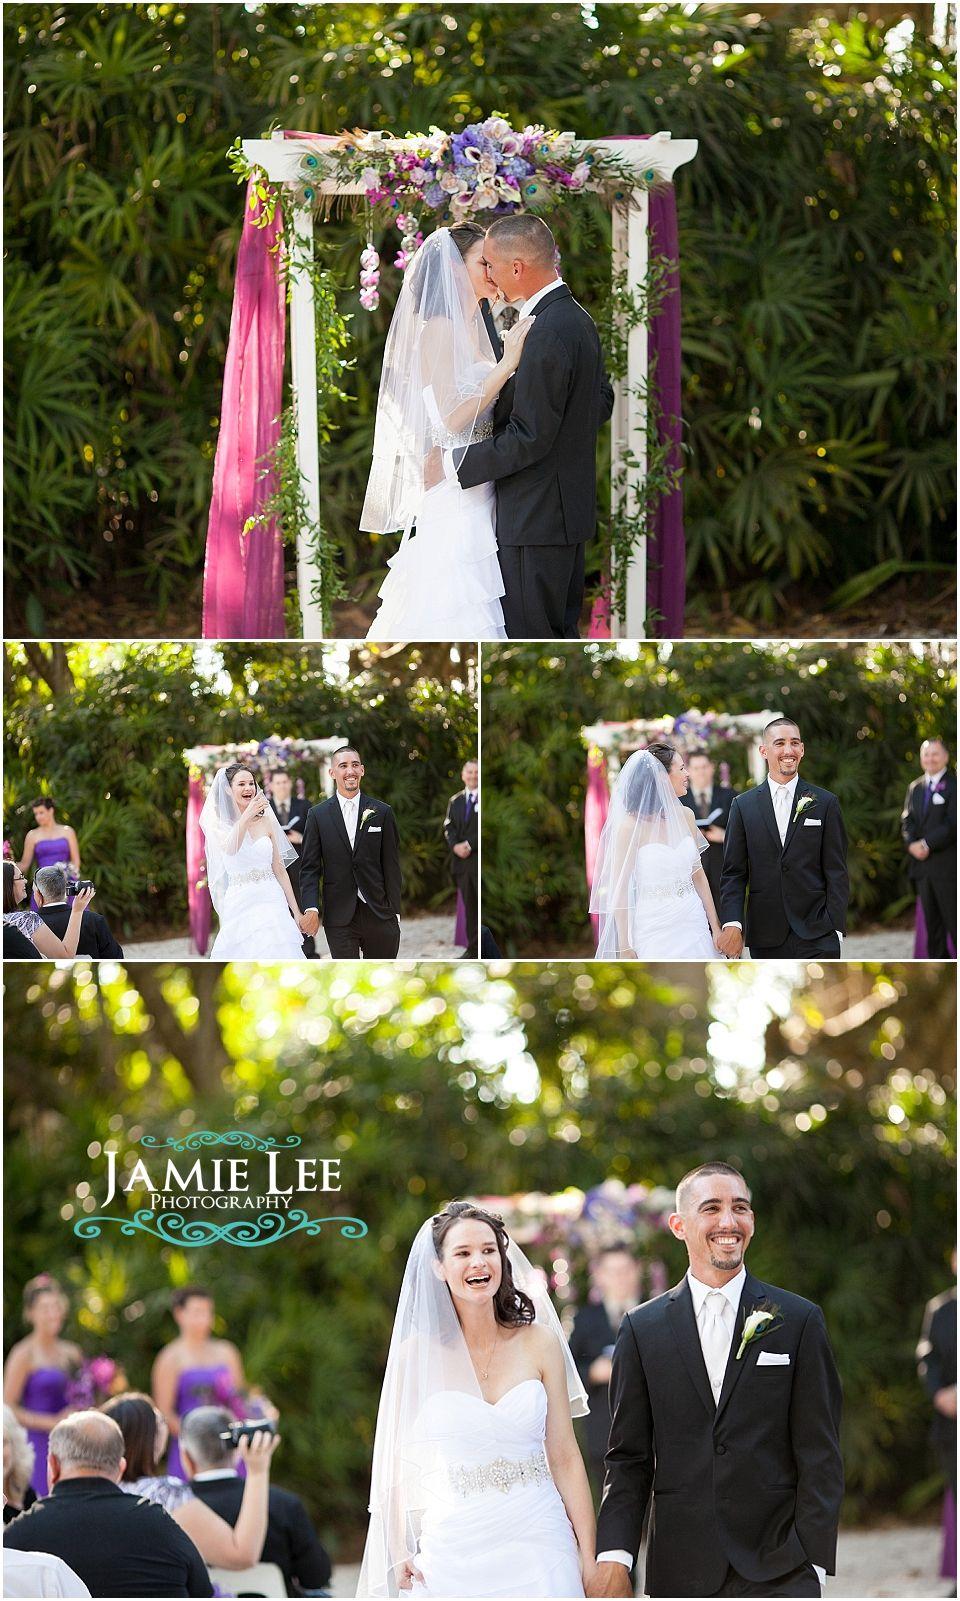 Natalie and Chris │ Naples Zoo Wedding Photographer │ Purple Peacock Feathers_0012